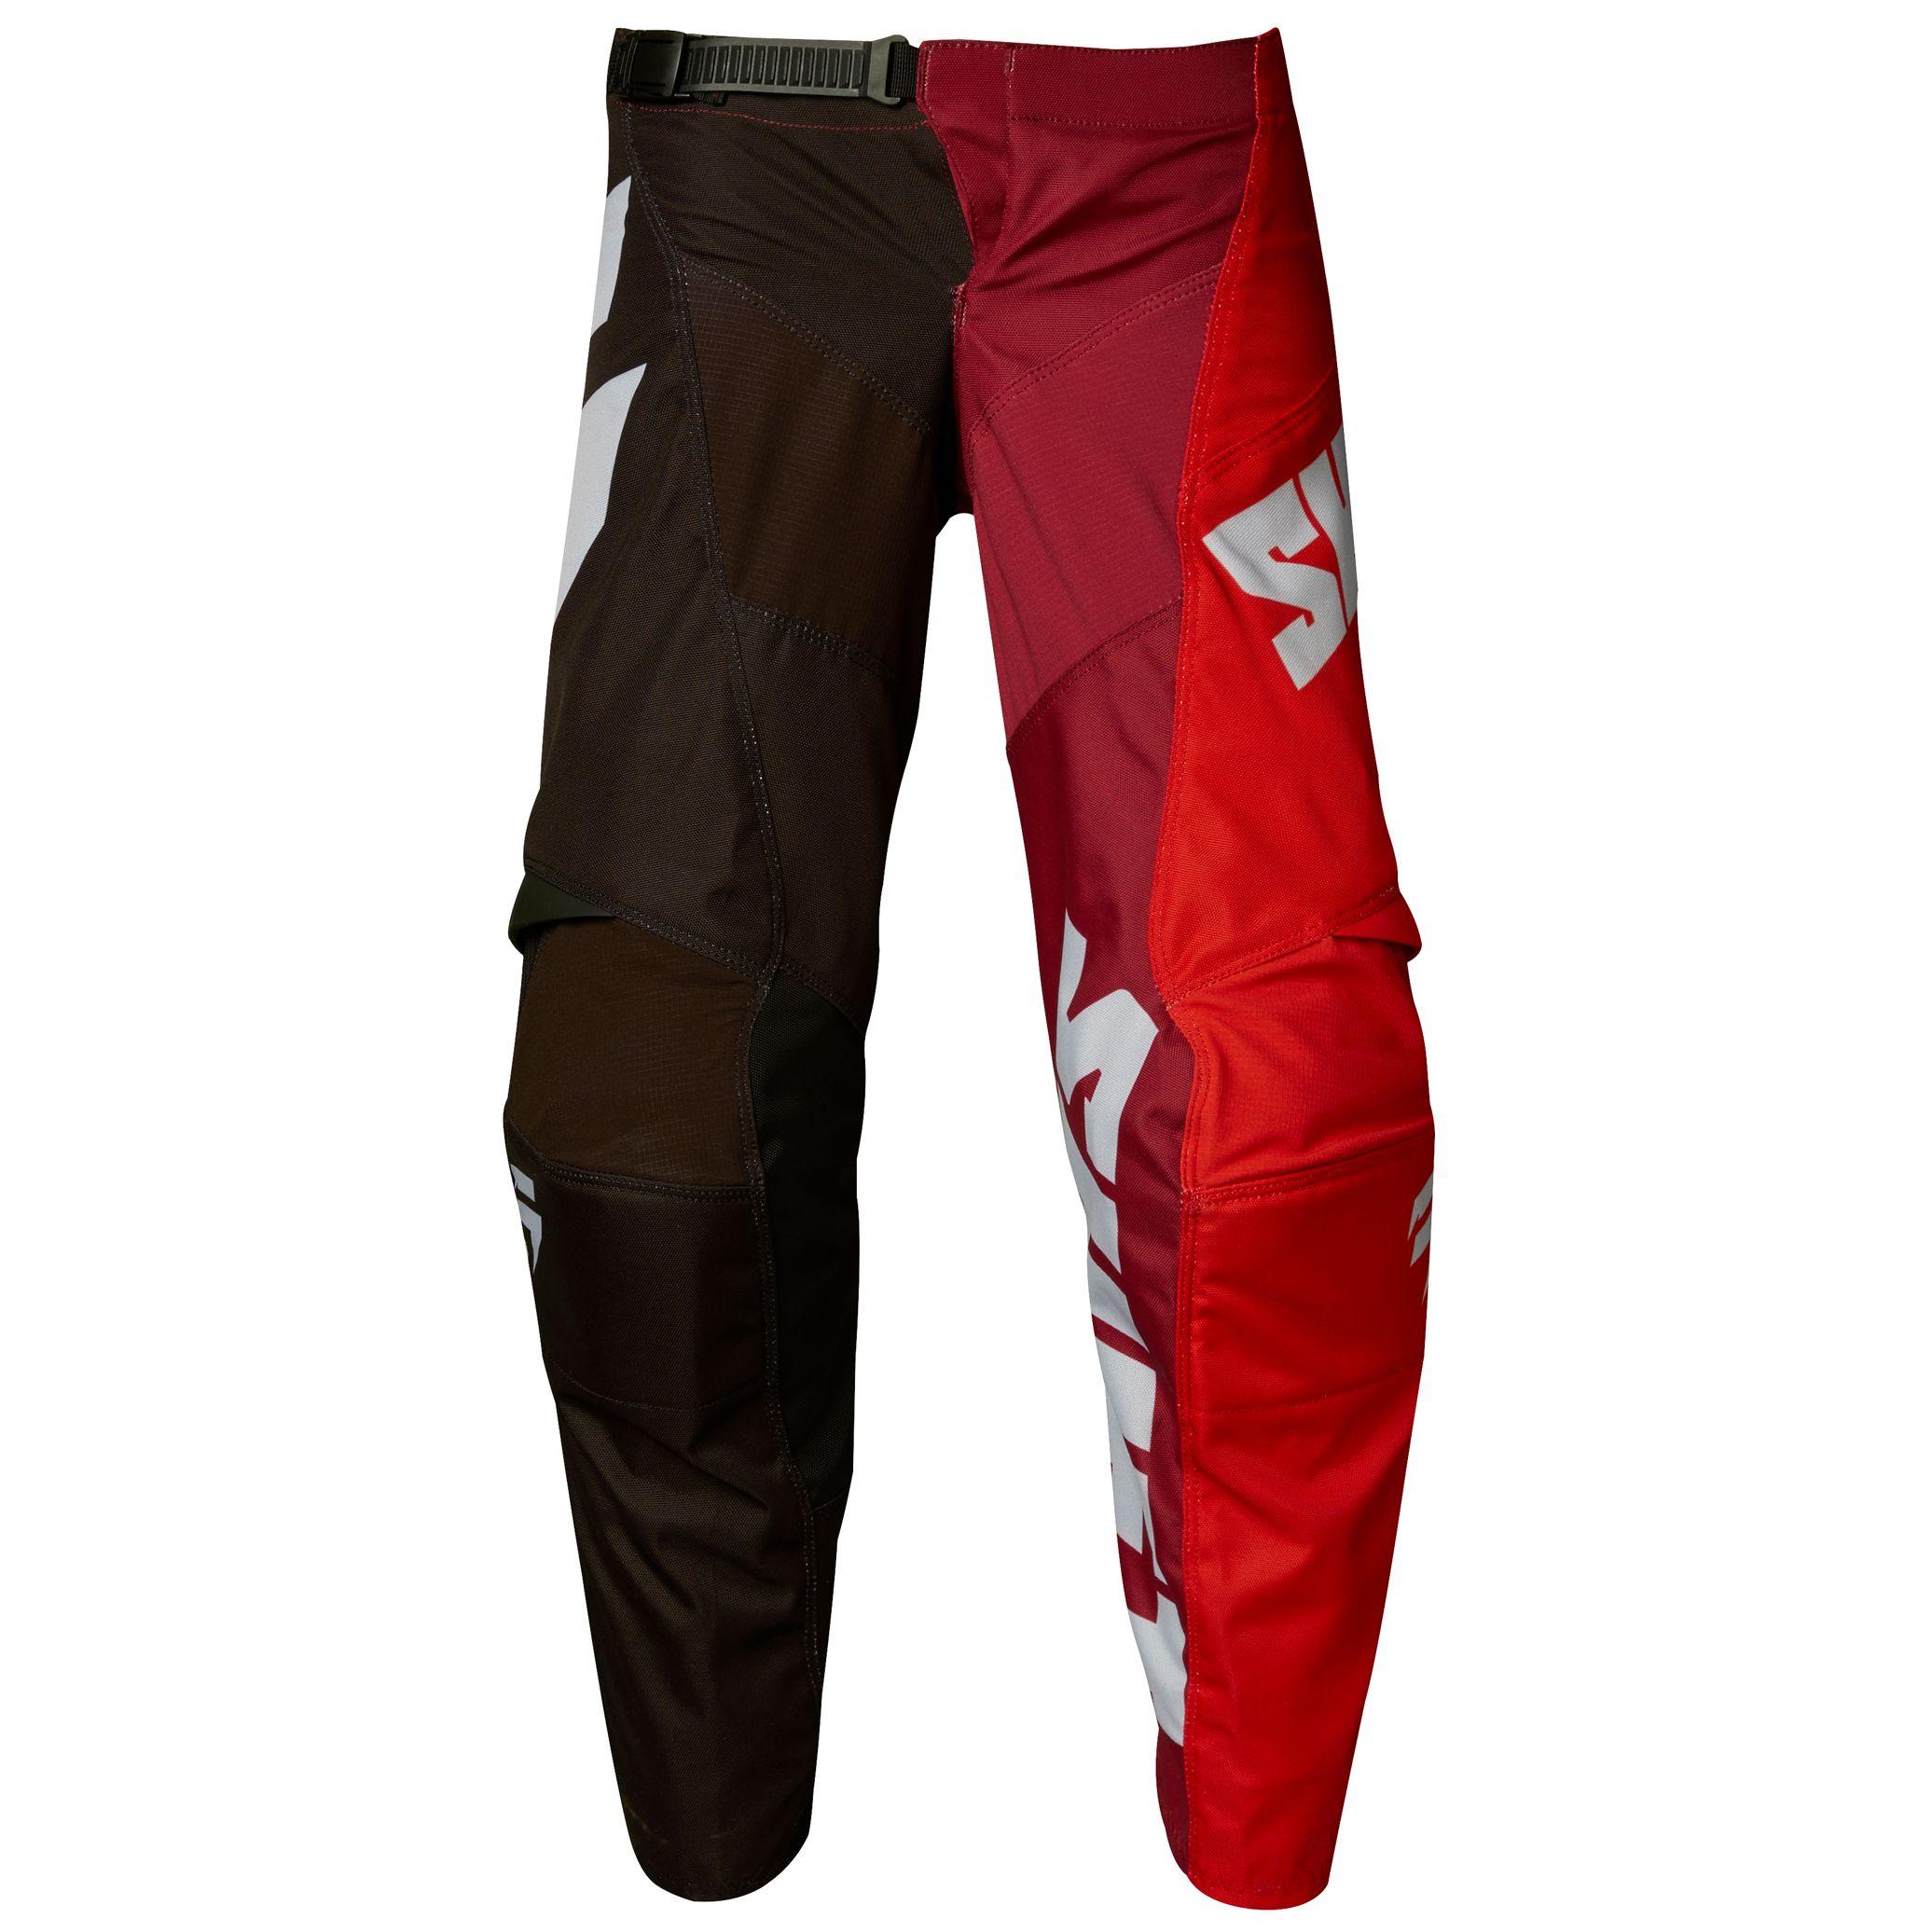 pantalon cross shift youth white tarmac noir rouge 2018 tenue cross. Black Bedroom Furniture Sets. Home Design Ideas